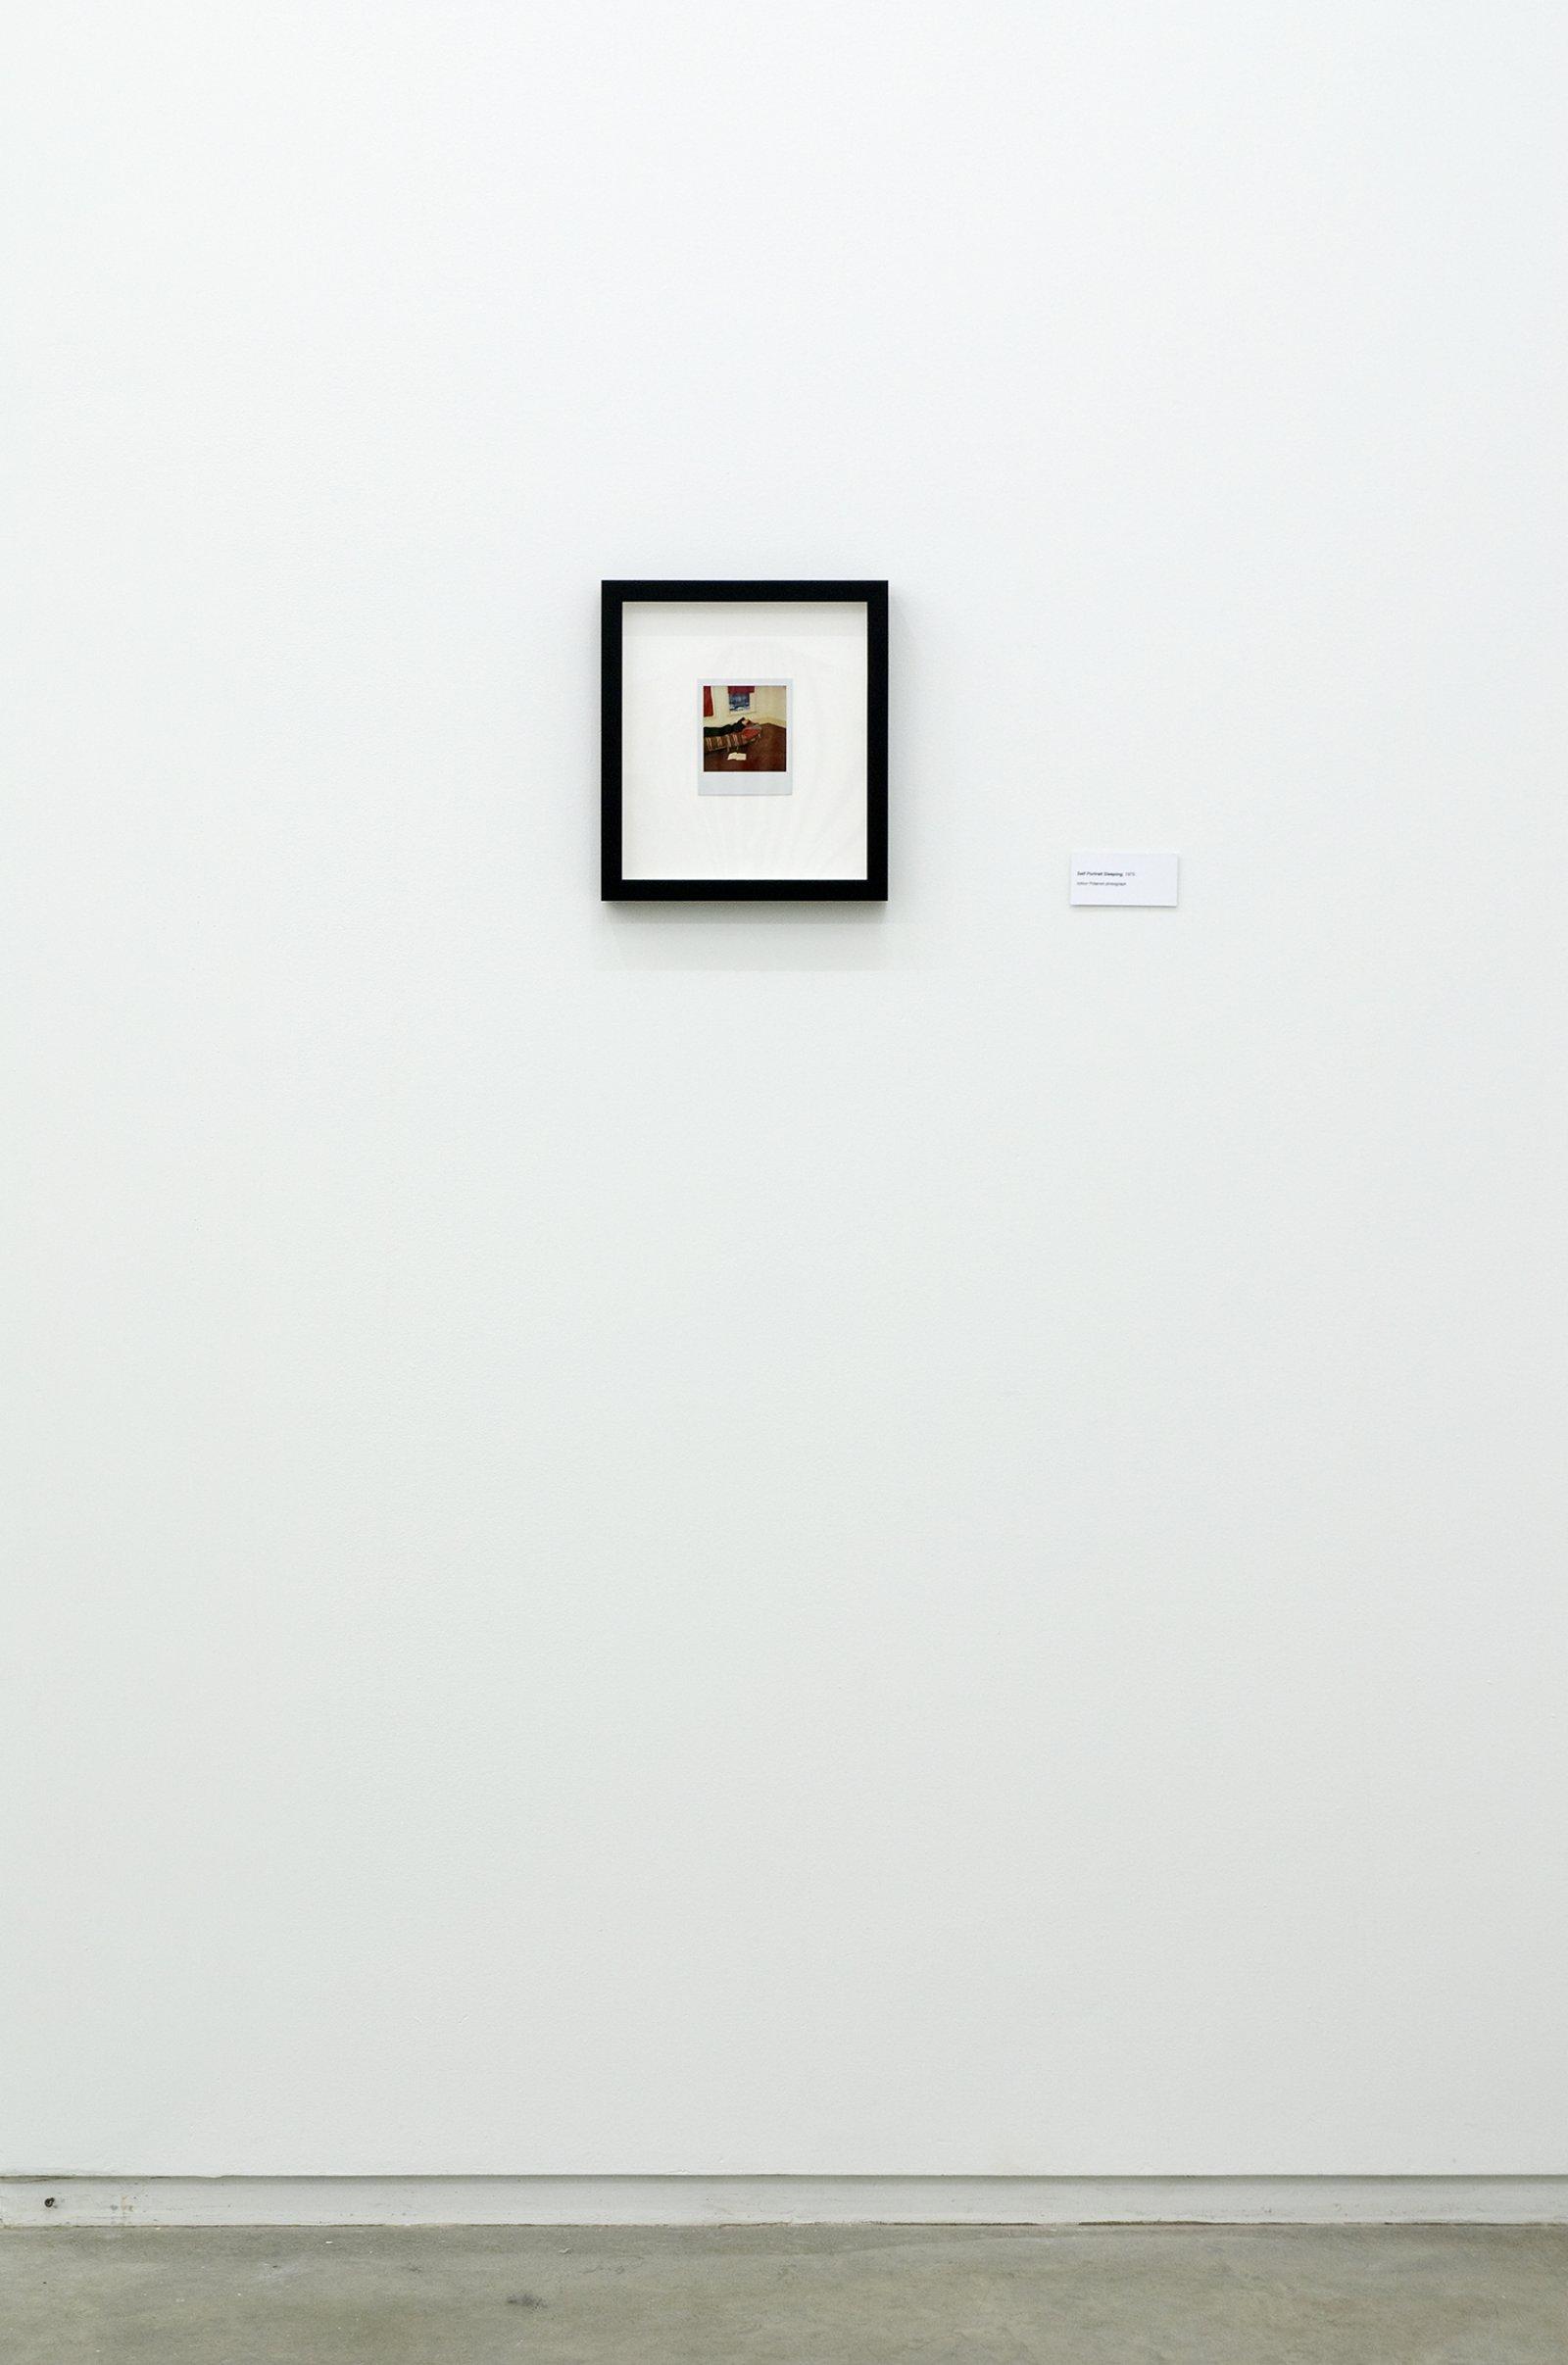 Ian Wallace,Self-Portrait Sleeping, 1979, coloured polaroid photograph,4 x 4 in. (11 x 9 cm)